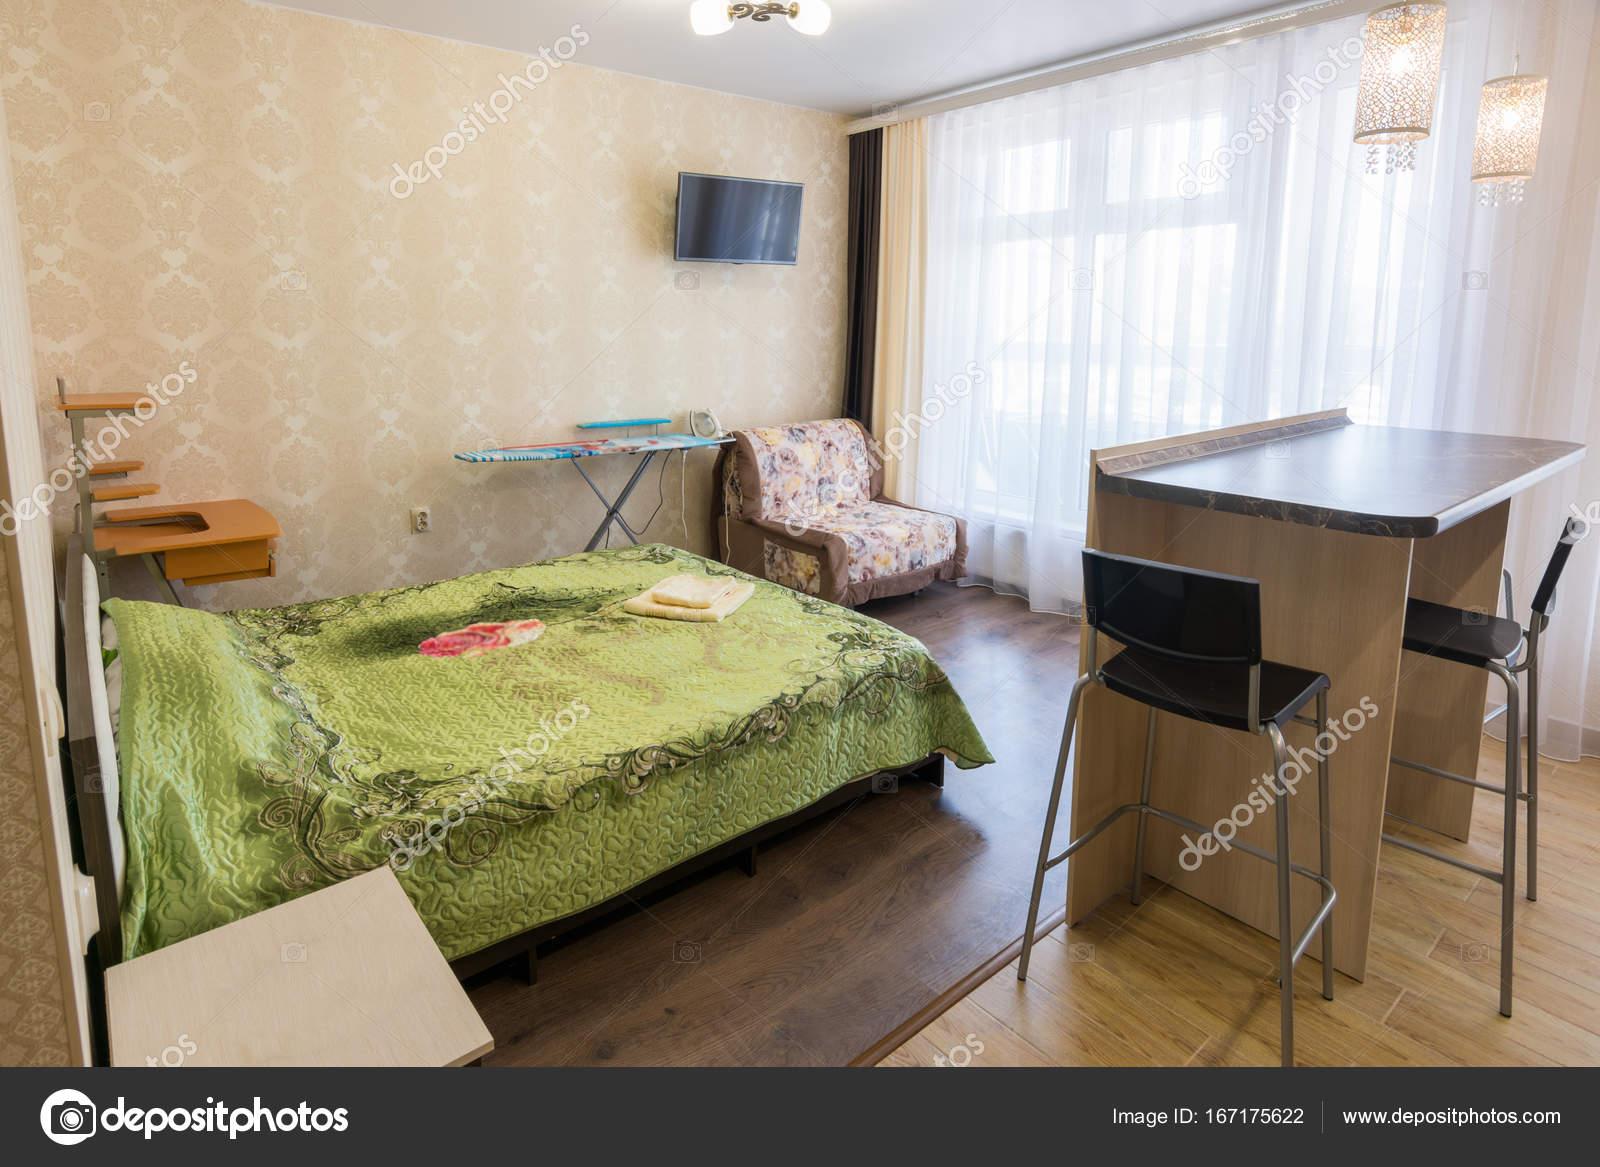 https://st3.depositphotos.com/2143661/16717/i/1600/depositphotos_167175622-stock-photo-interior-of-a-bedroom-with.jpg